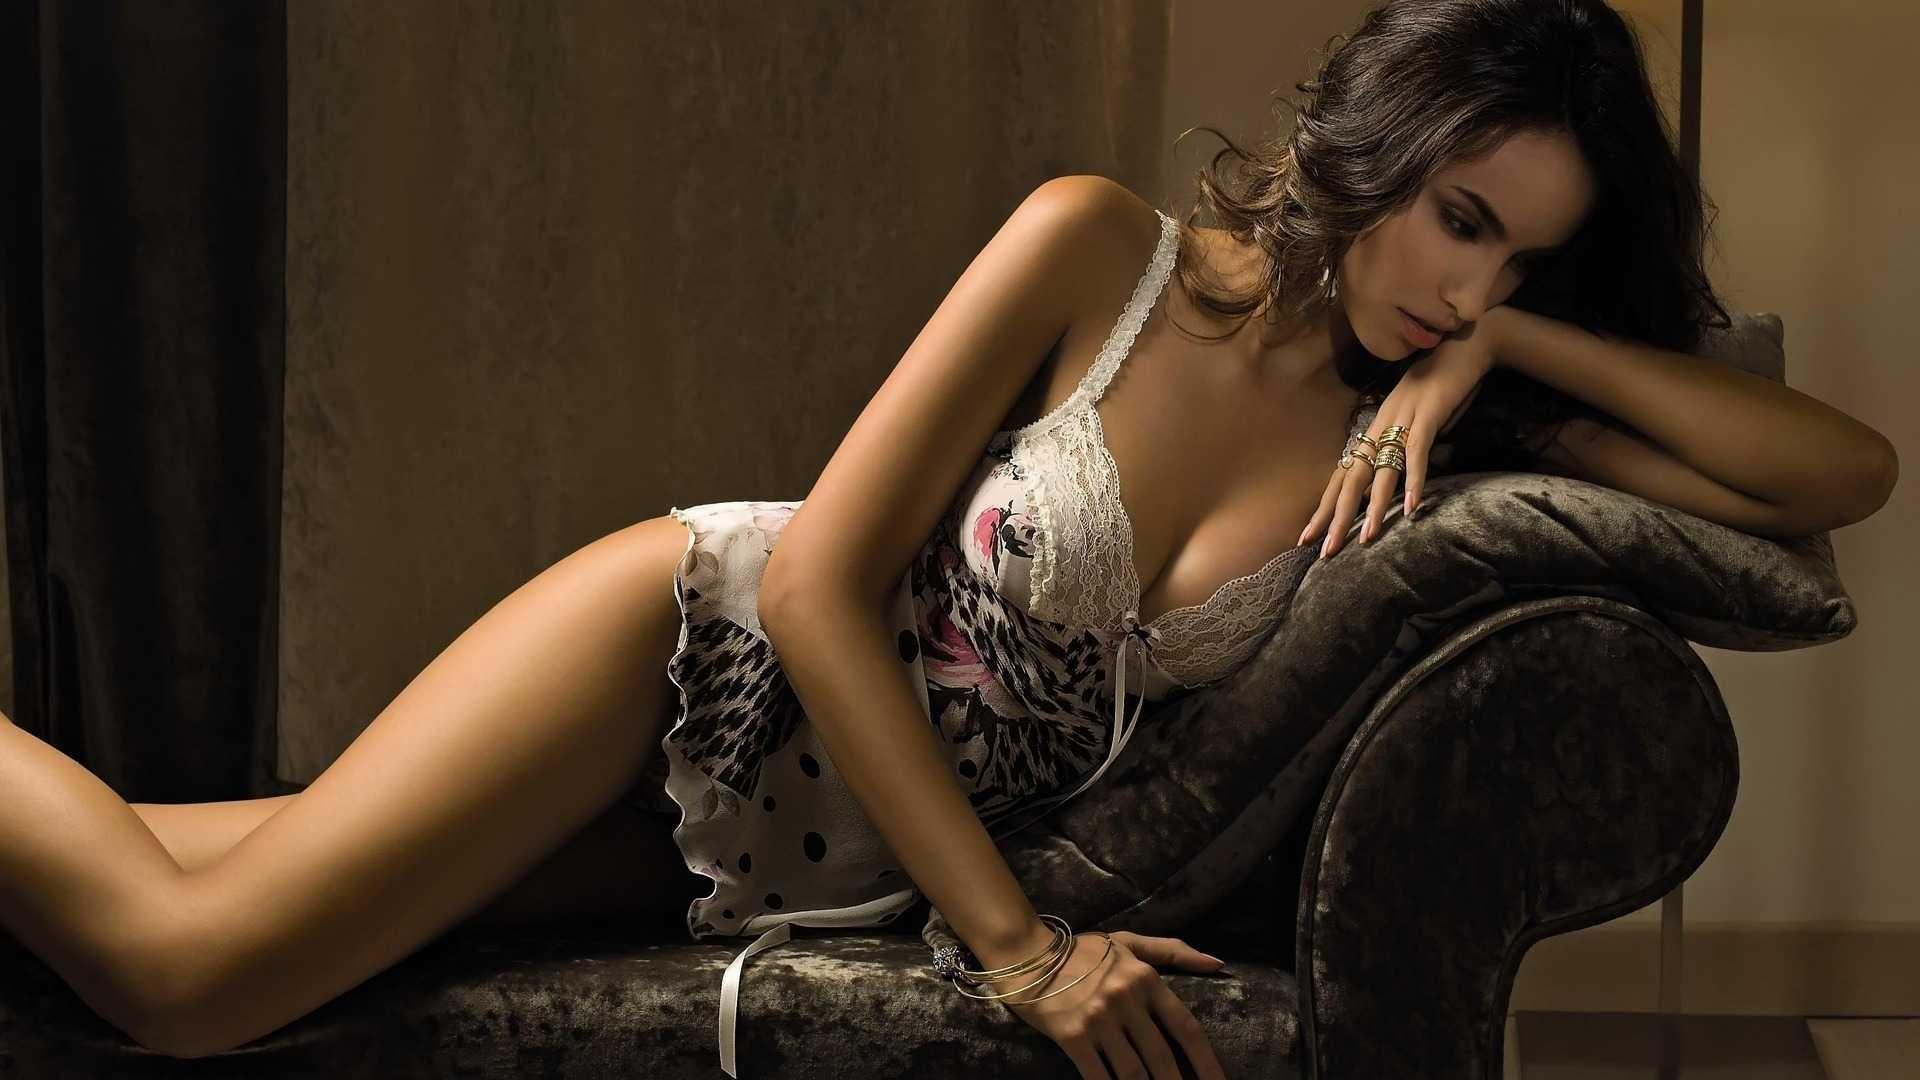 hot-girls-hd-wallpapers-1 | hot girls hd wallpapers | pinterest | hd